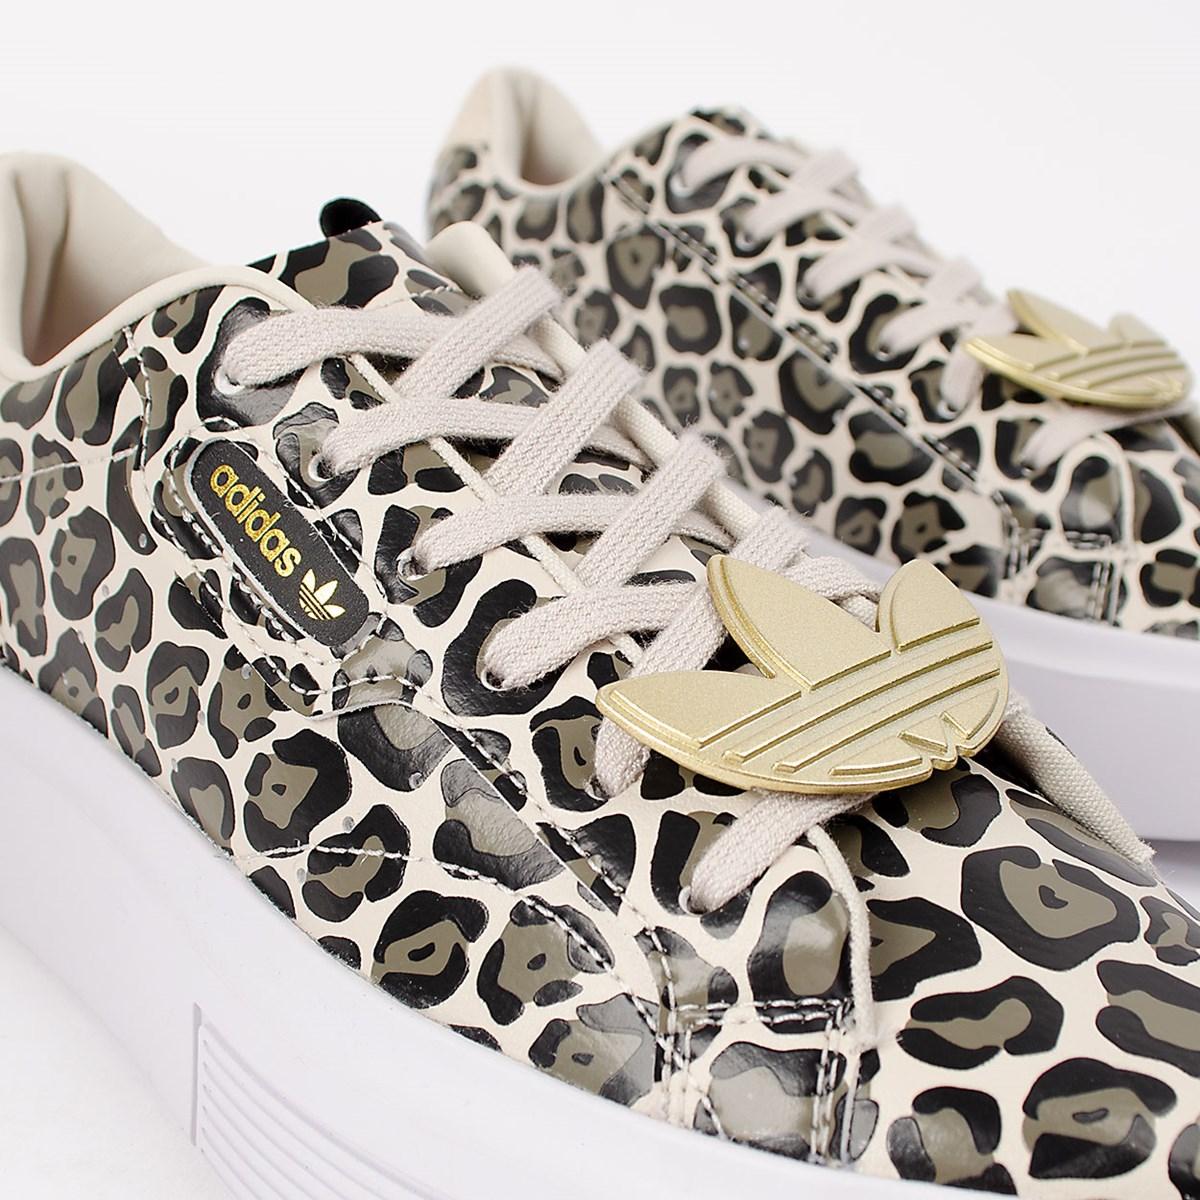 Tênis adidas Sleek Super Clear Brown FY5075